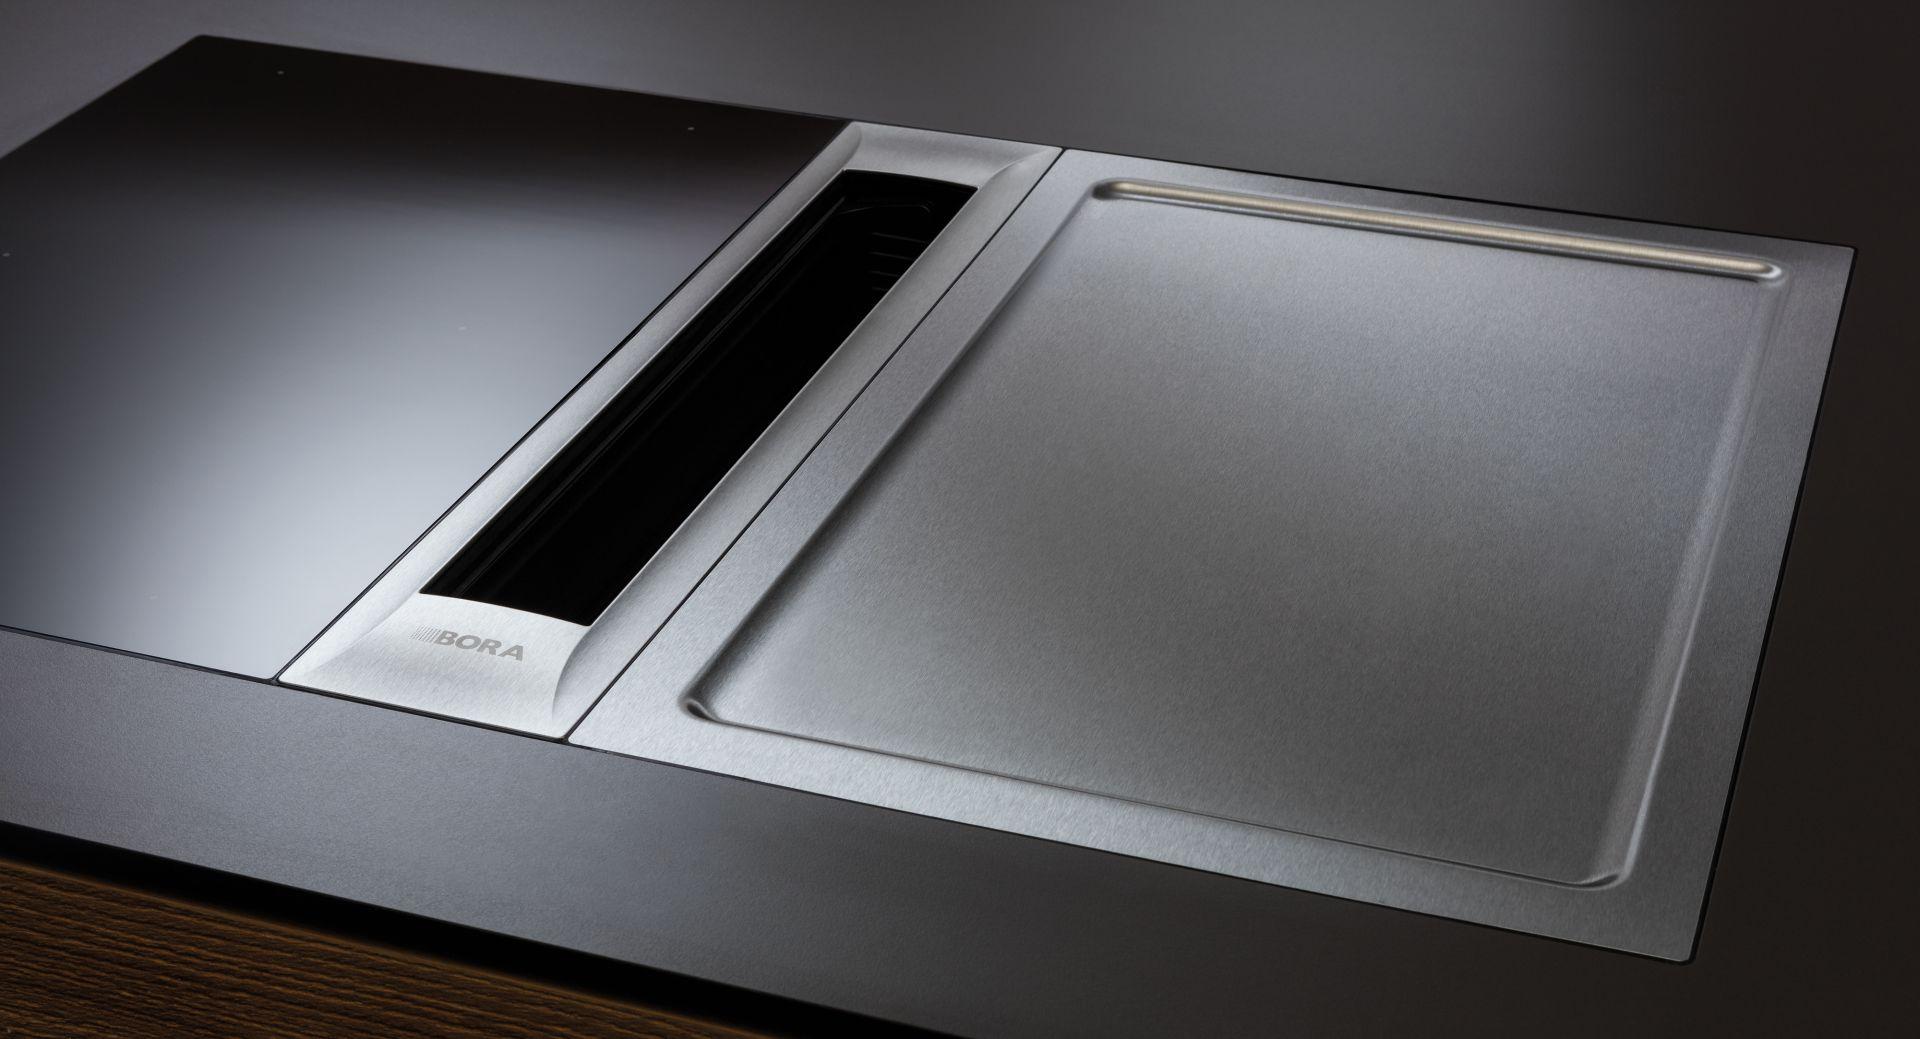 bora professional 2 0 kuchyn sch ller nexttradestore. Black Bedroom Furniture Sets. Home Design Ideas